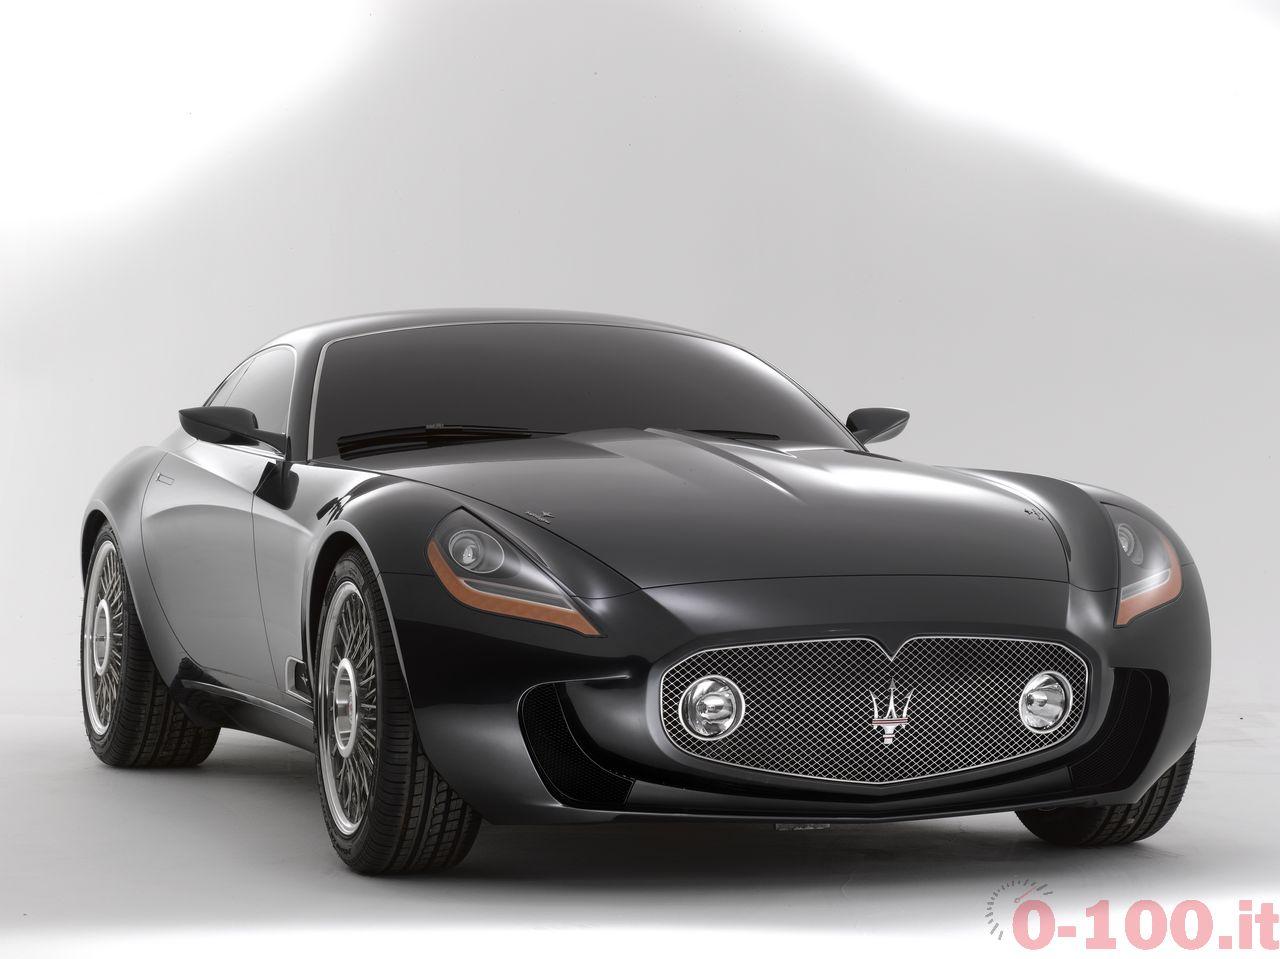 maserati-a8-gcs-touring-superleggera-carrozzeria-0-100_2